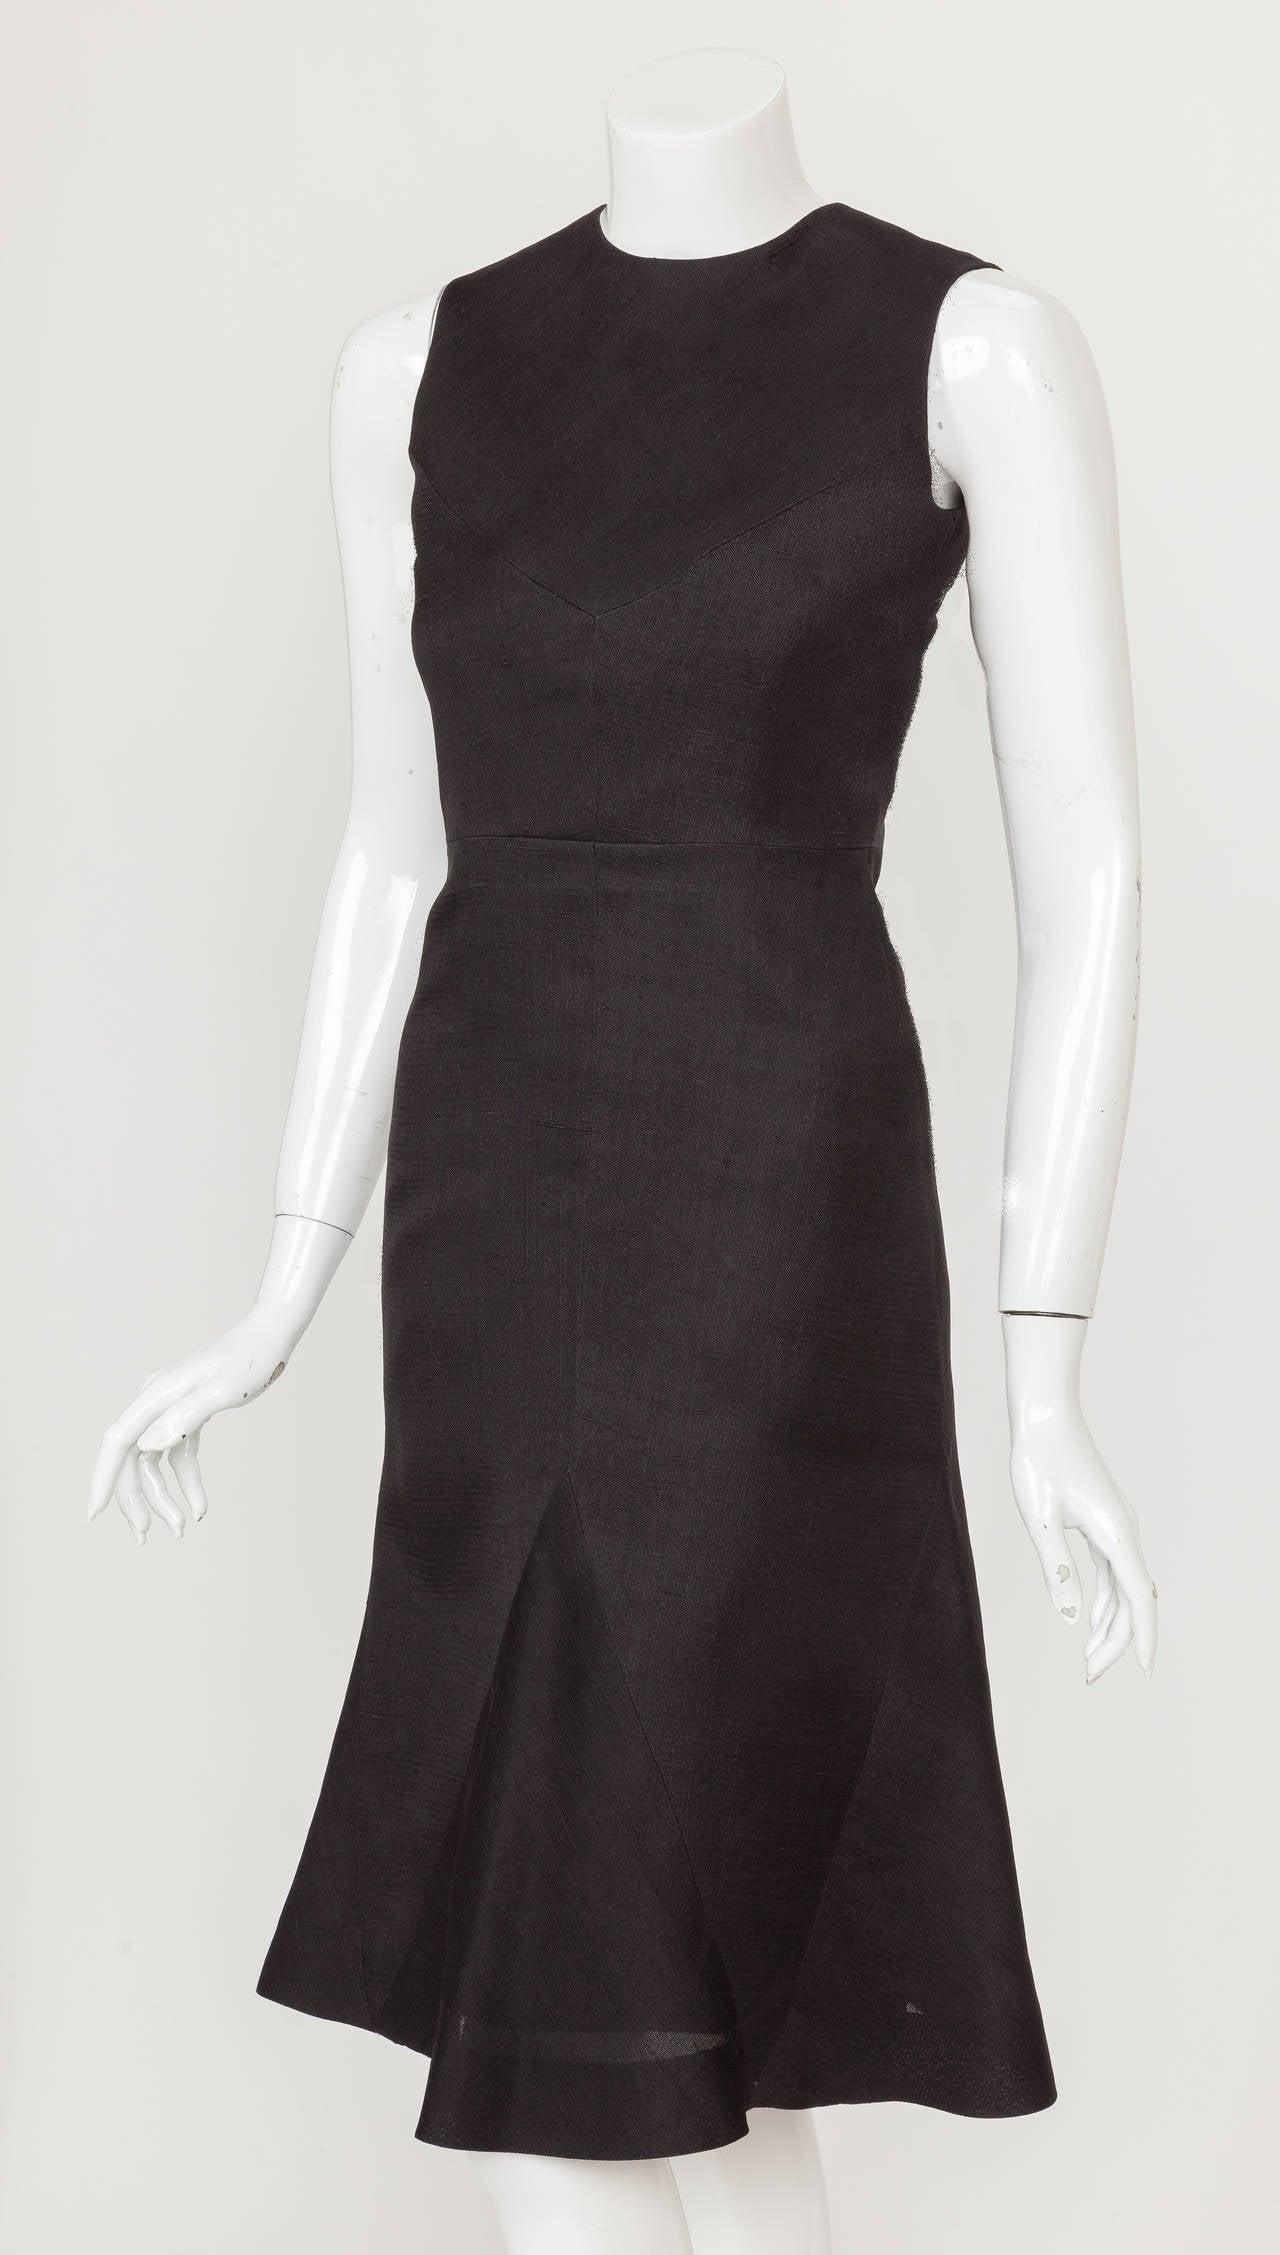 1974 Pierre Balmain Haute Couture Runway Cocktail Dress No. 57179 2